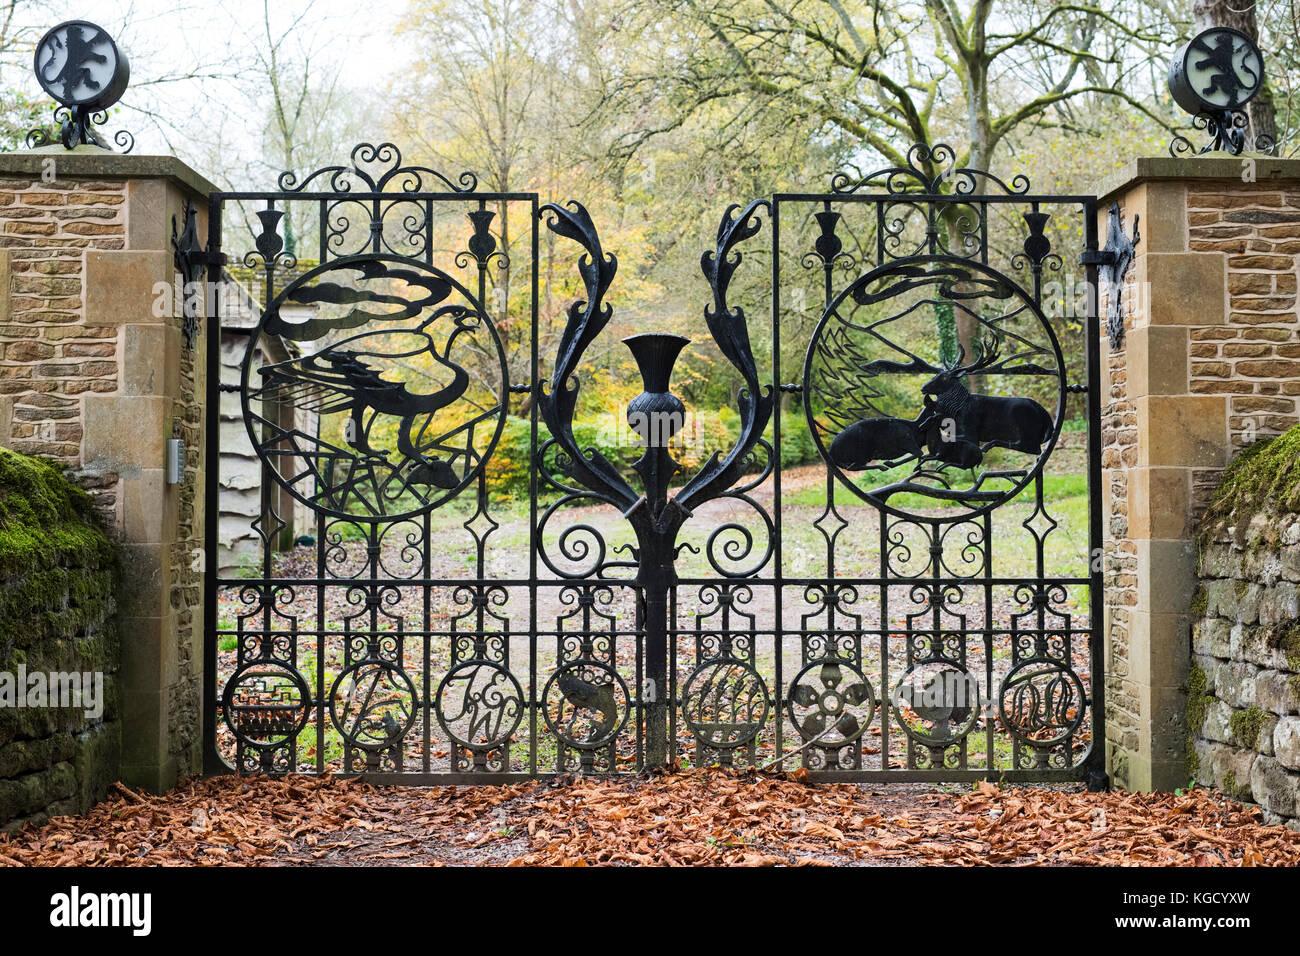 Wrought iron gates driveway stock photos